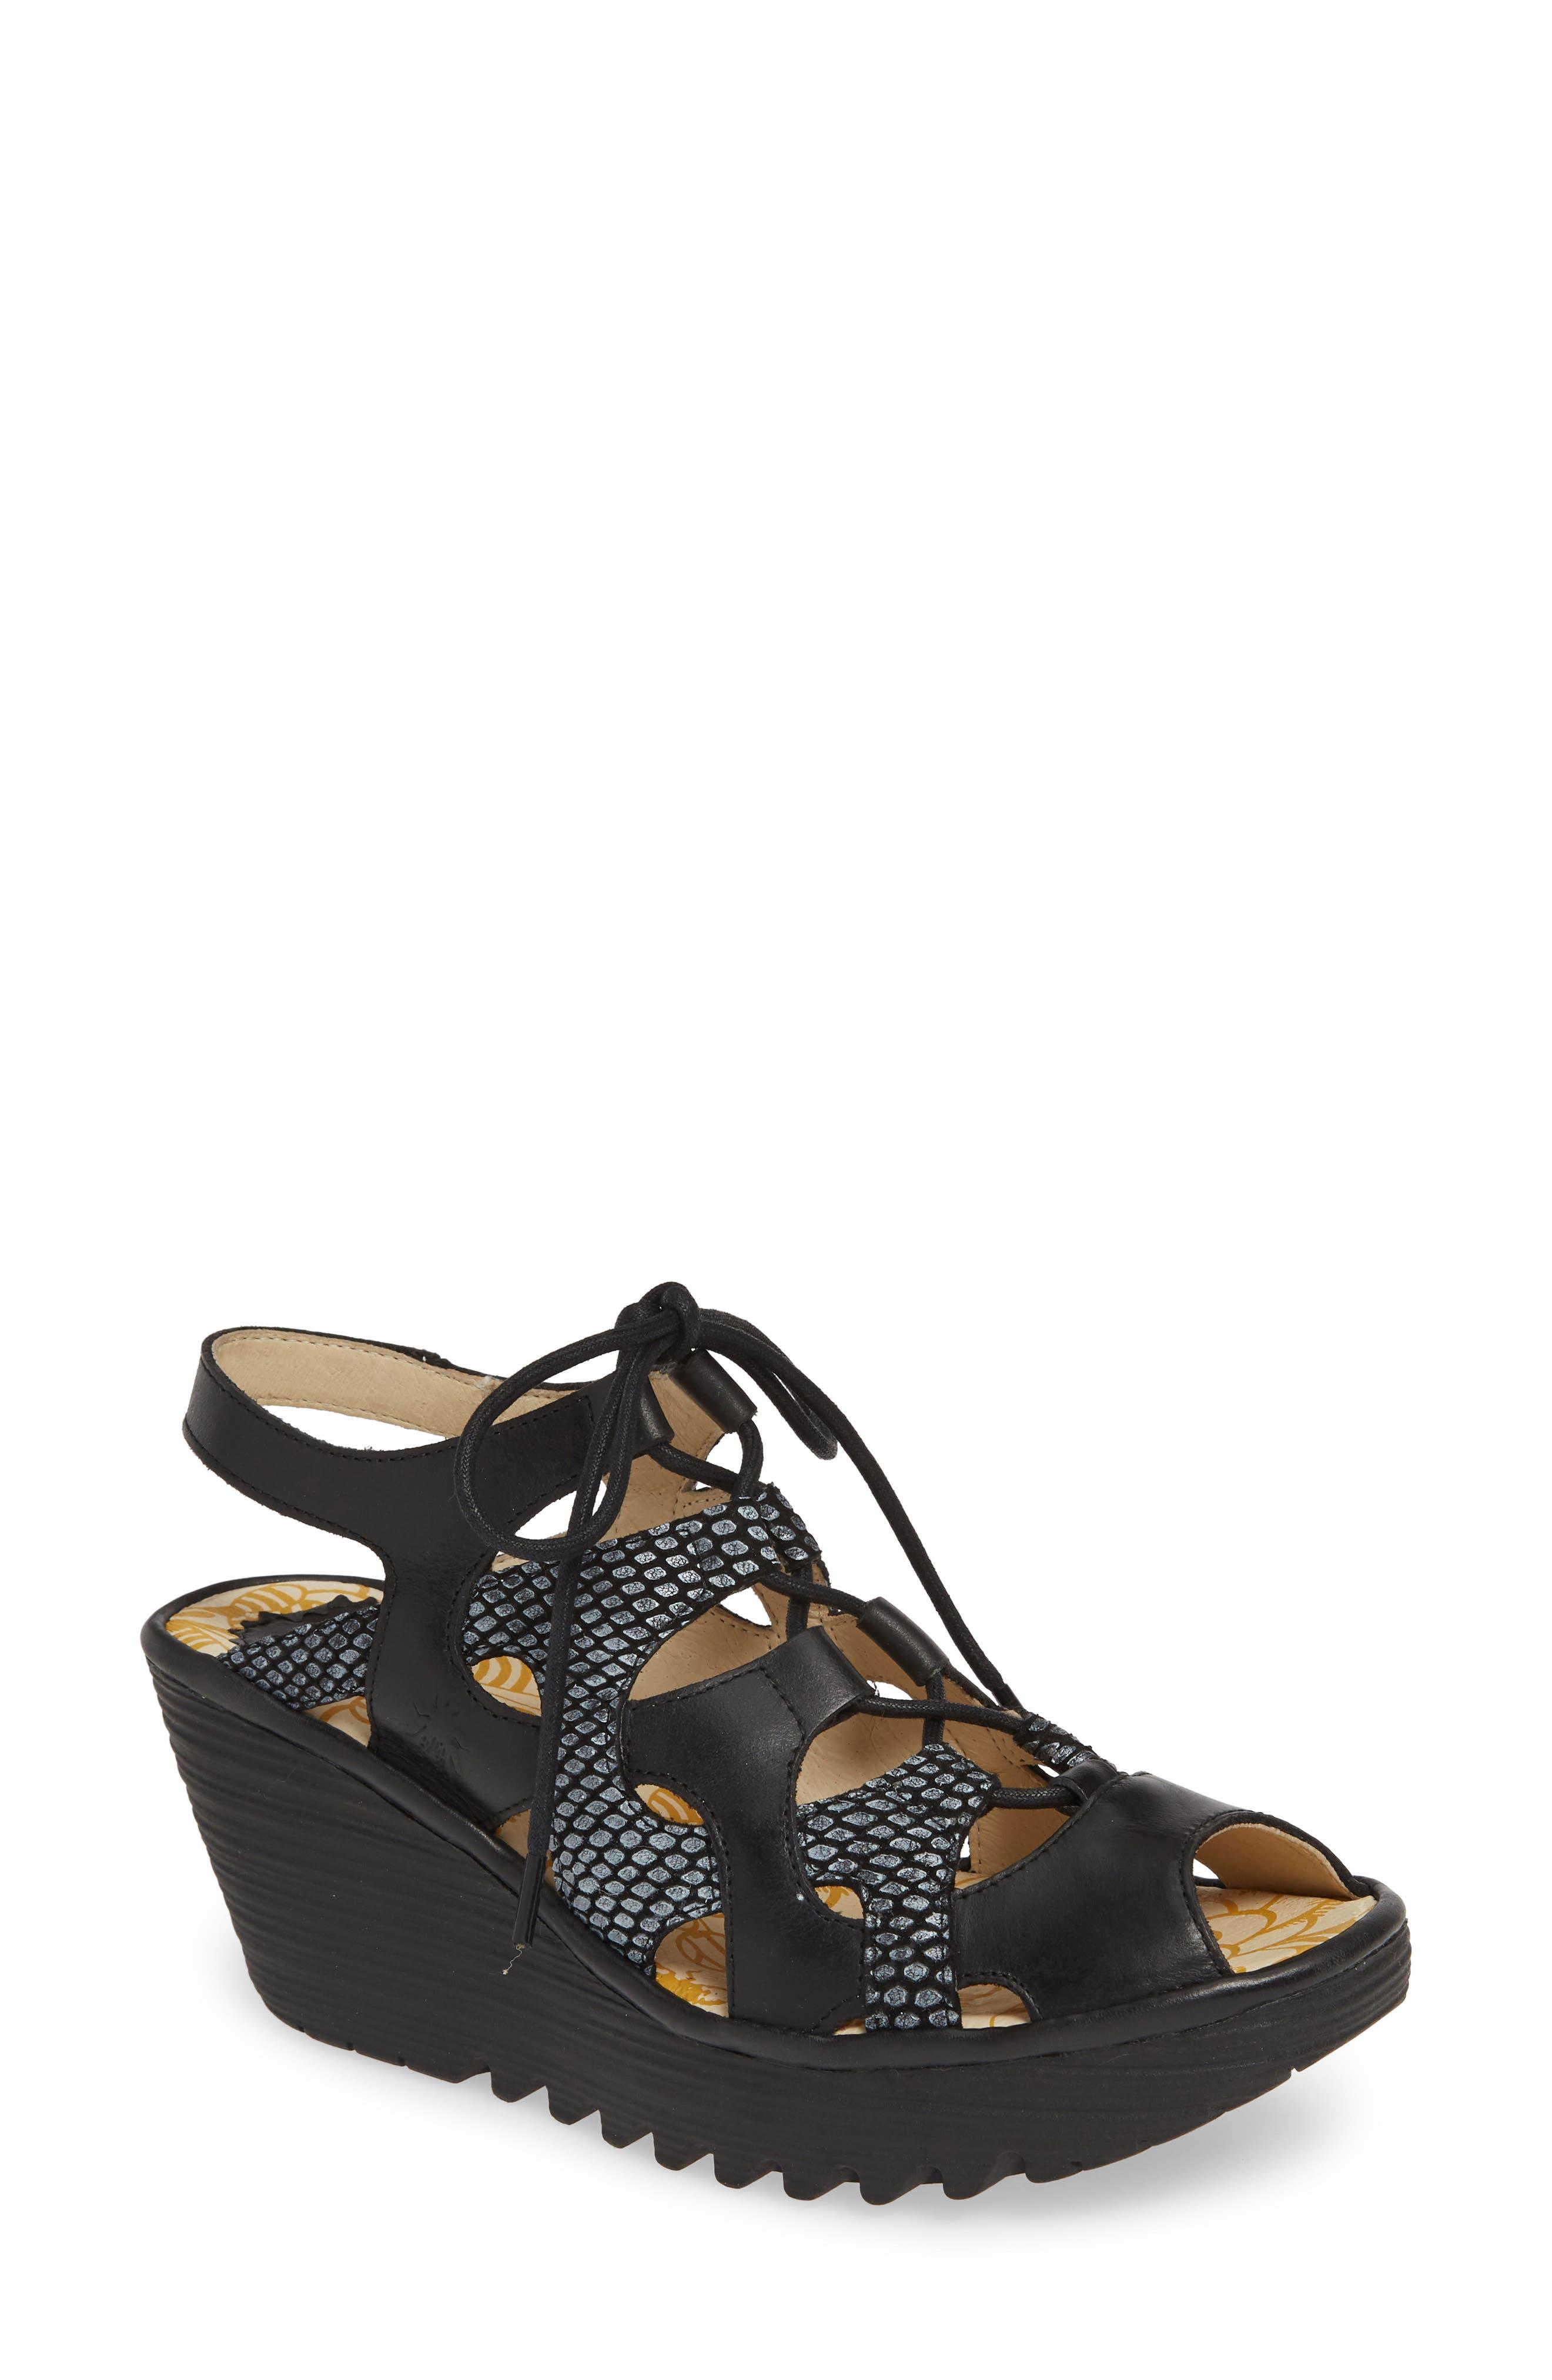 FLY LONDON Yexa Sandal, Main, color, BLACK LEATHER